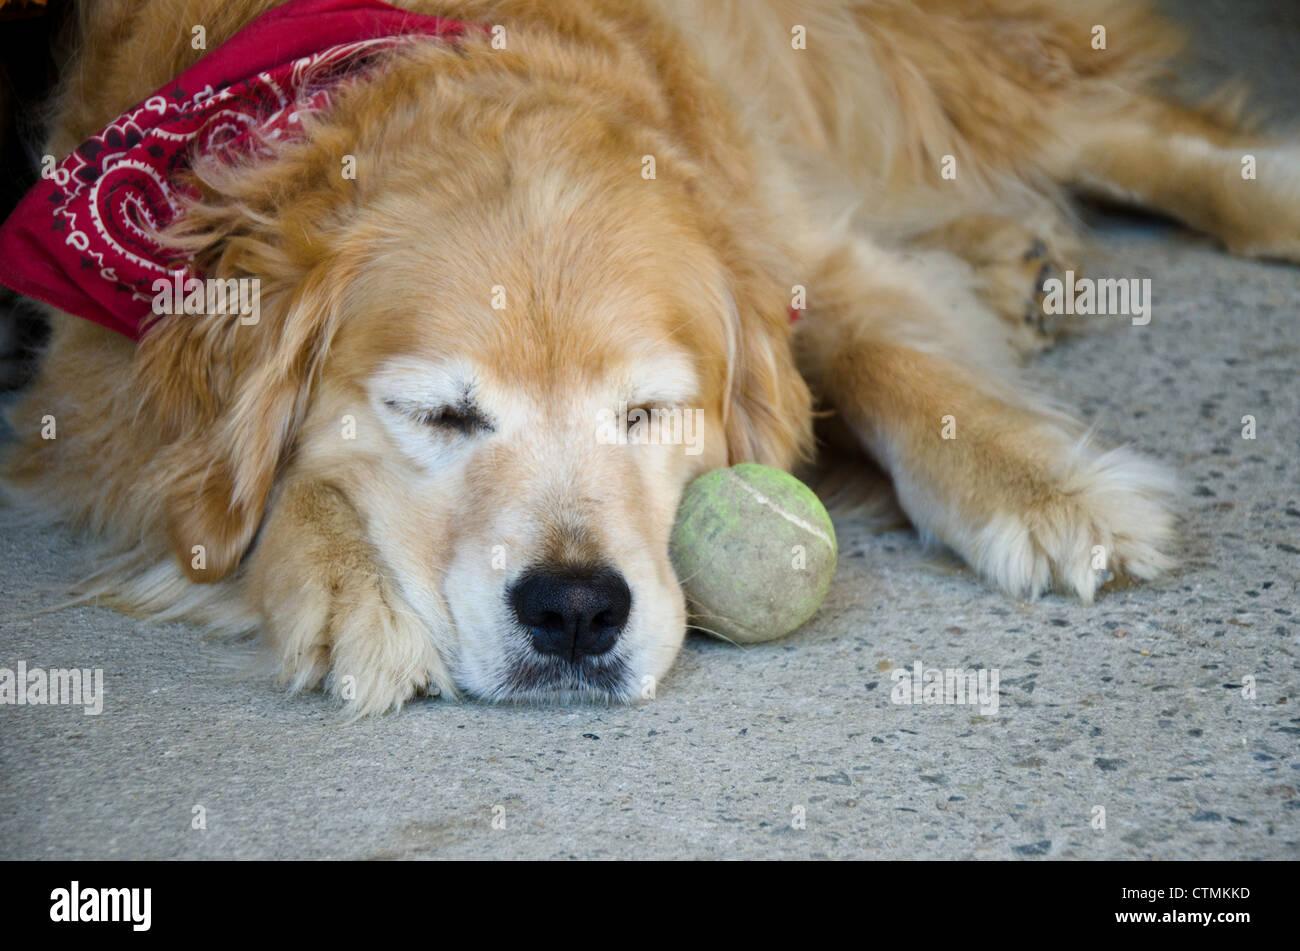 Golden retriever dog with red bandana sleeping beside tennis ball, Maine USA - Stock Image